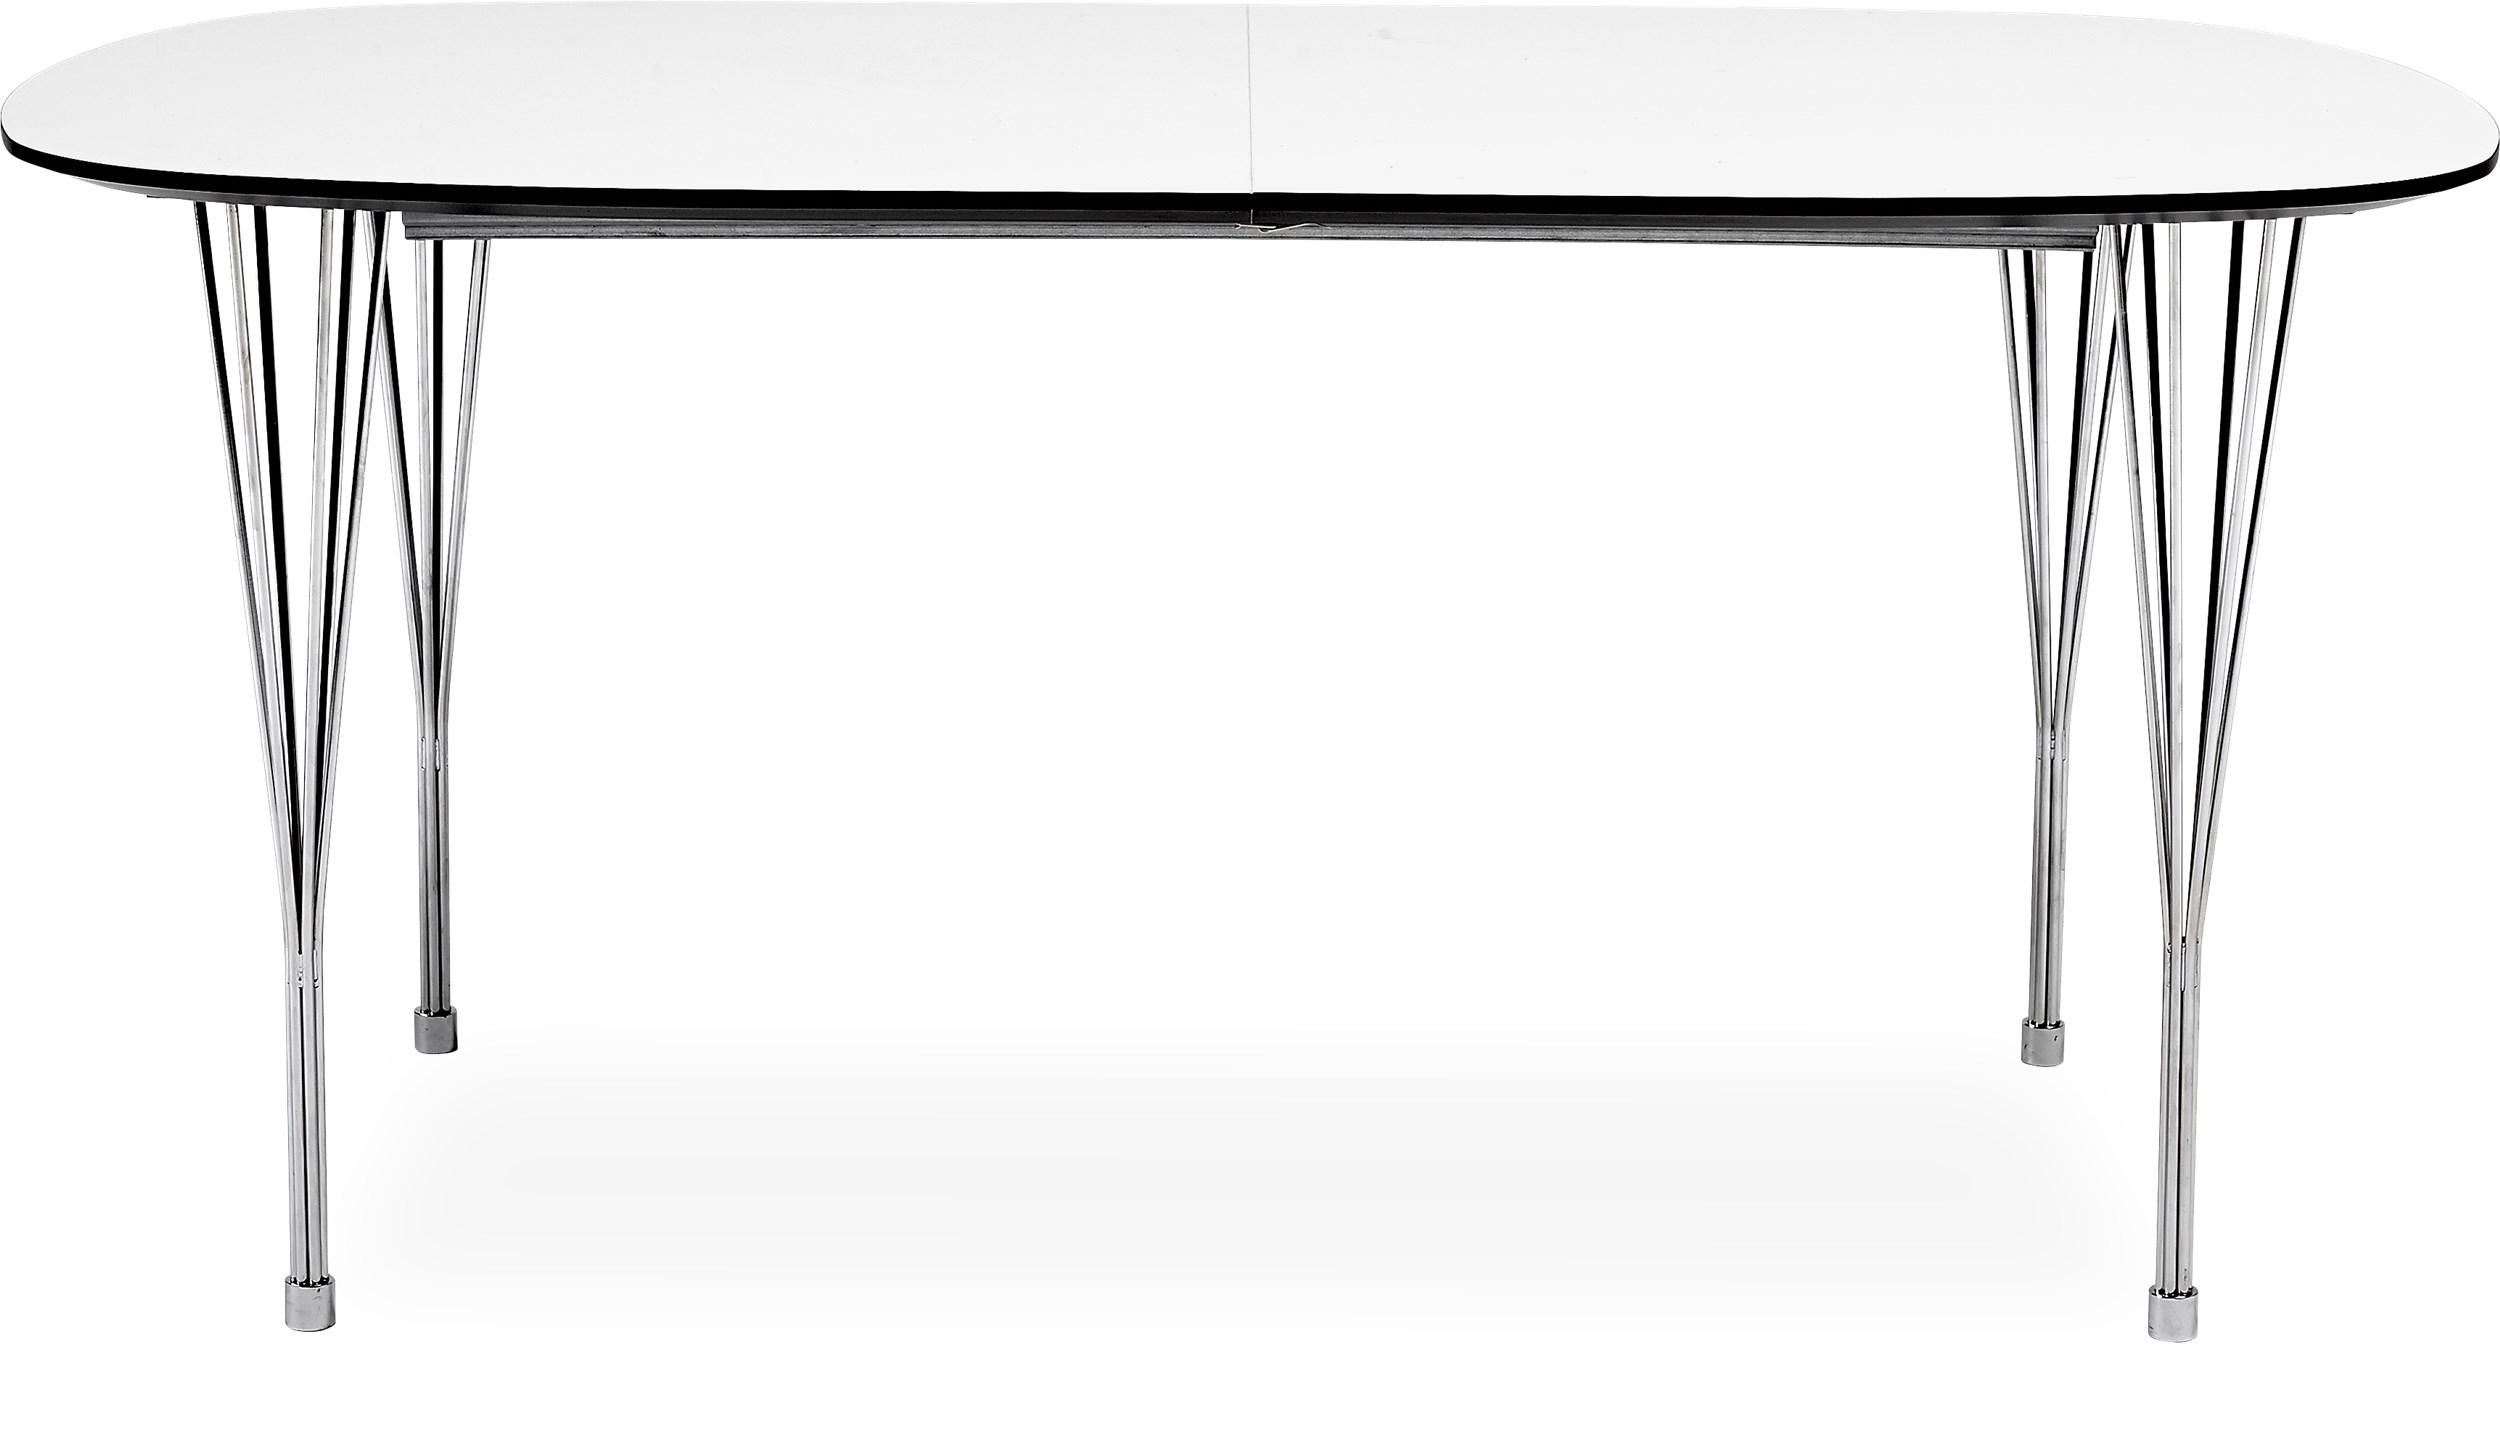 Prado 160 x 100 x 75 cm Spisebord